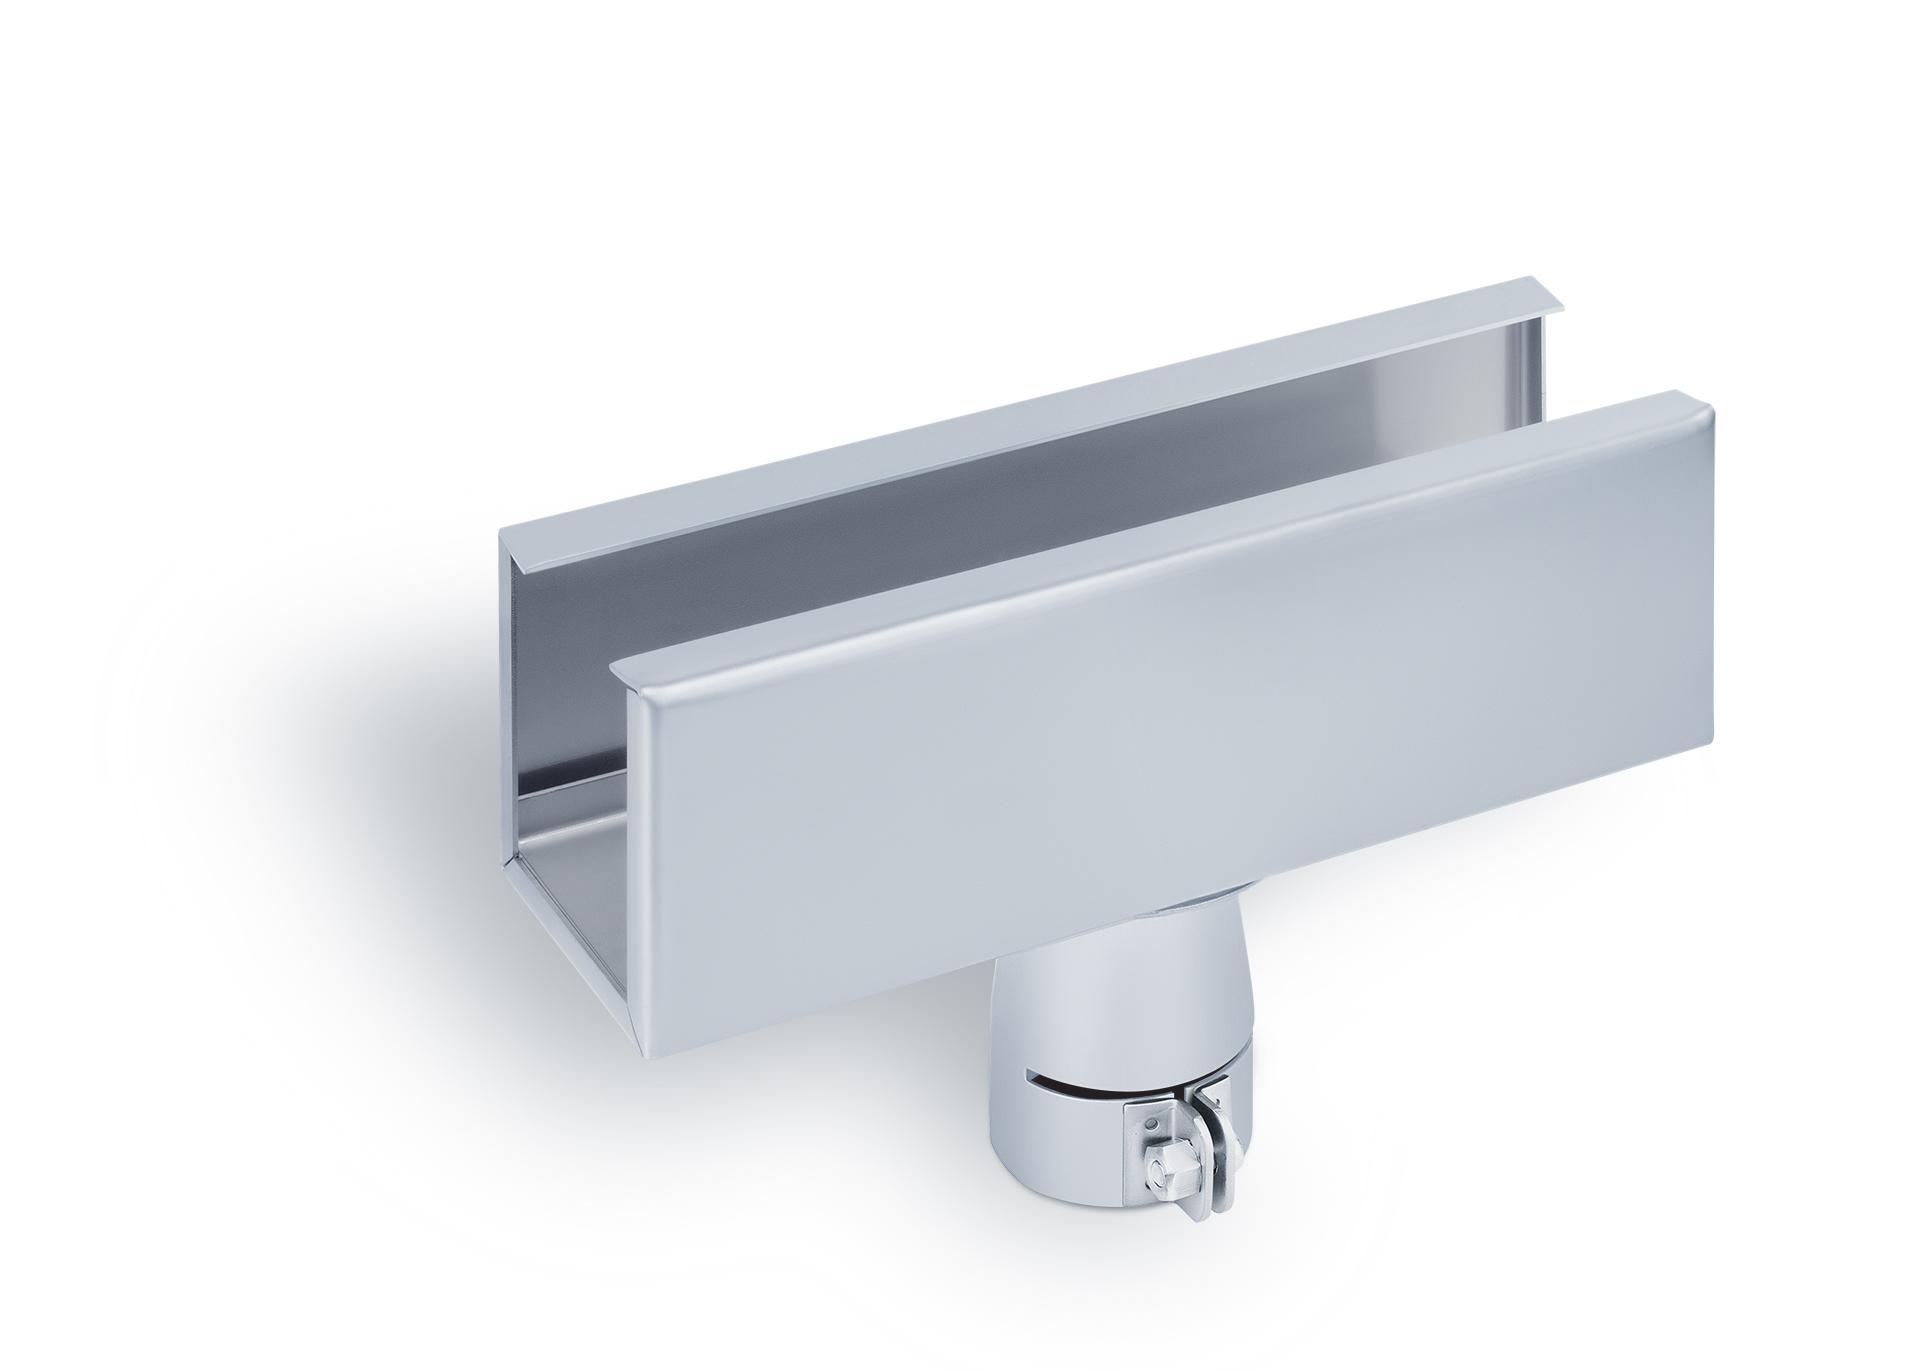 STEINEL PROFESSIONAL Skořepinová reflektorová tryska 150x25mm